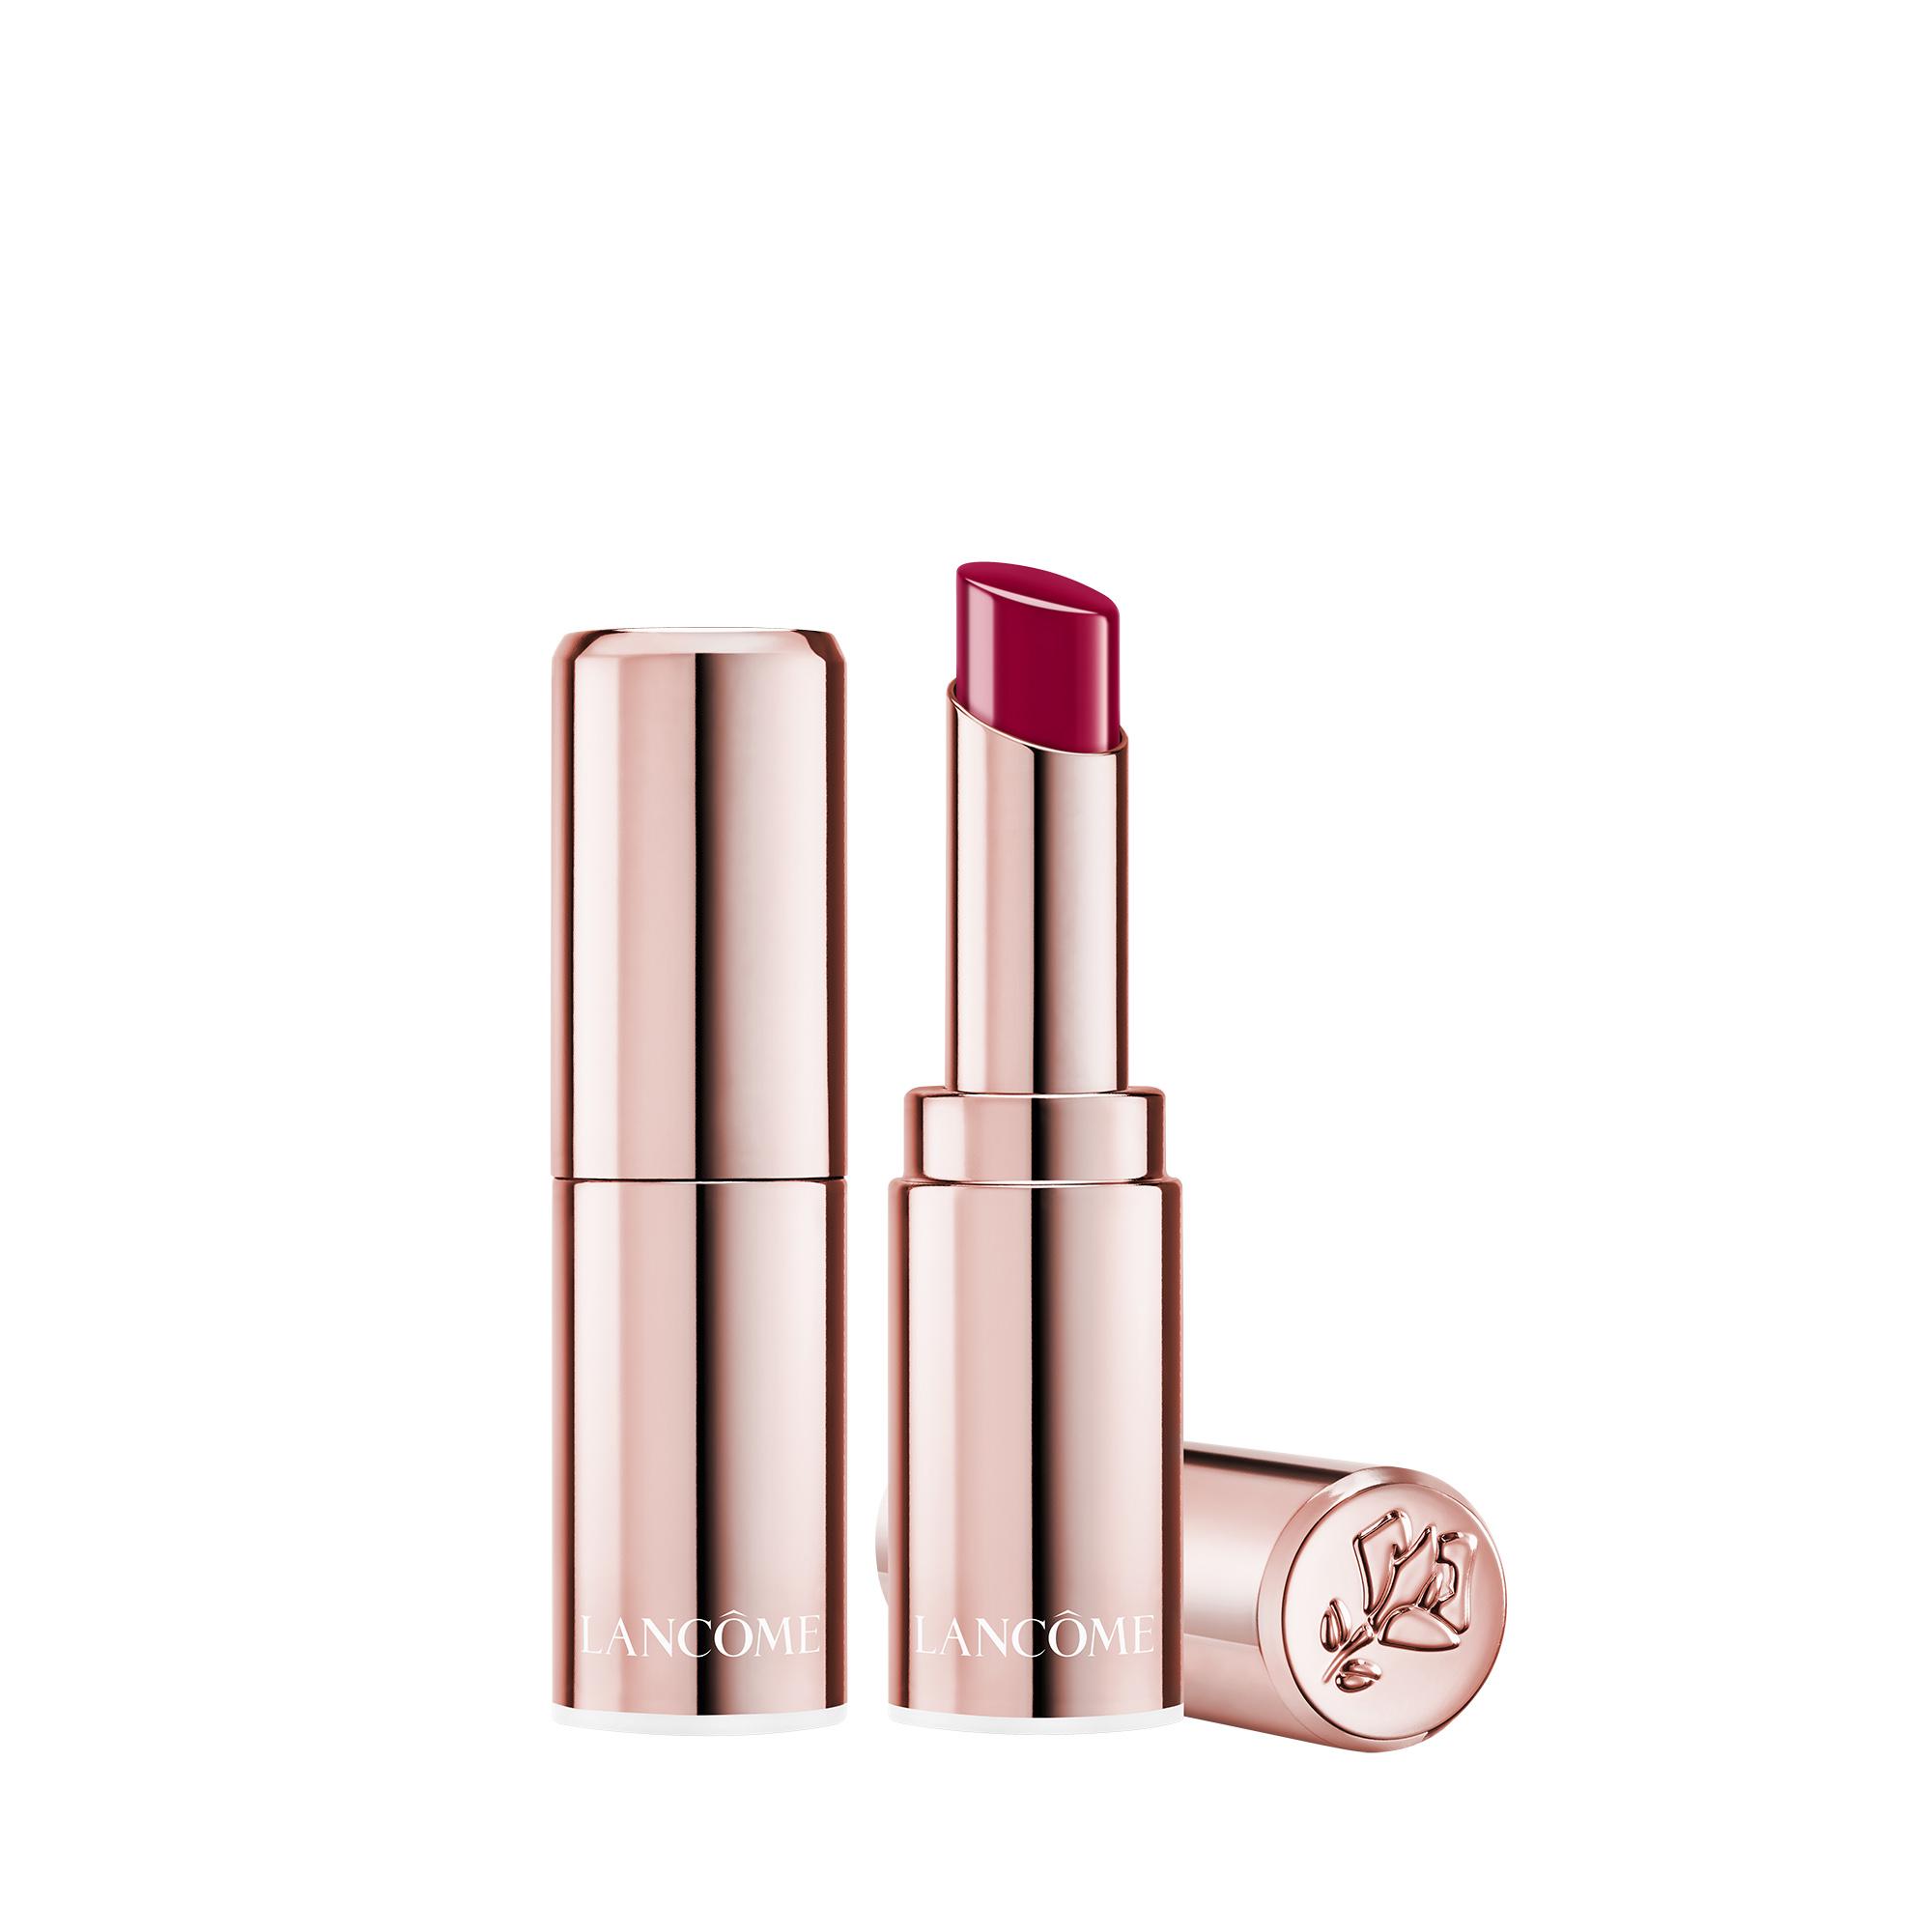 An image of Lancôme L'Absolu Mademoiselle Shine Lipstick - 368 MADEMOISELLE SMILES